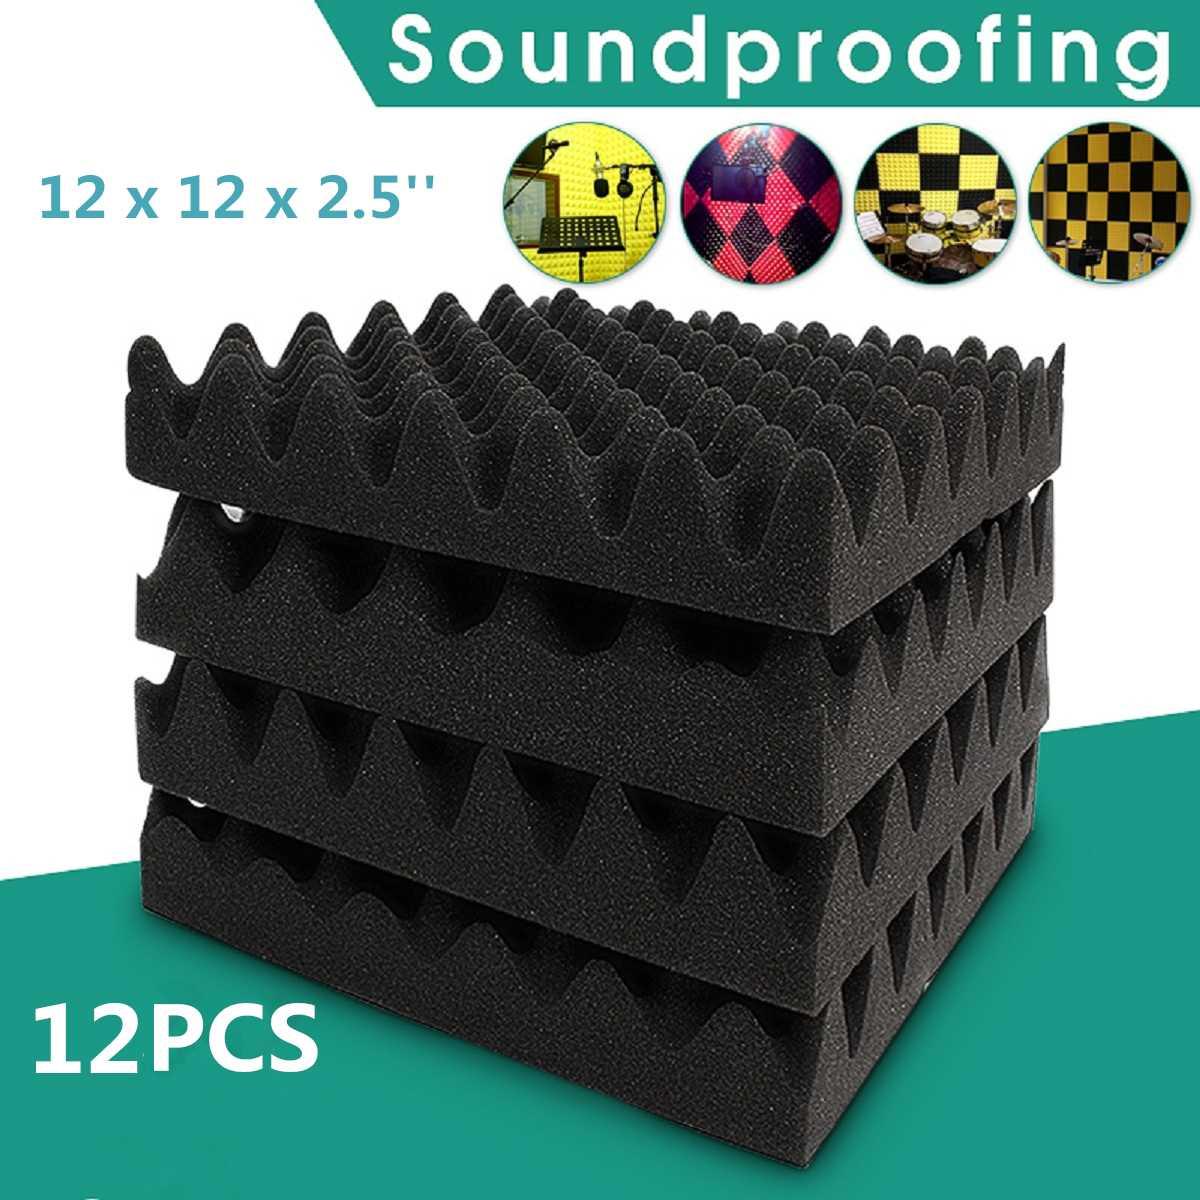 1PCS 30 x 30 x 6cm Soundproofing Foam Acoustic Foam Sound Treatment Studio Room Absorption Wedge Tiles Polyurethane foam